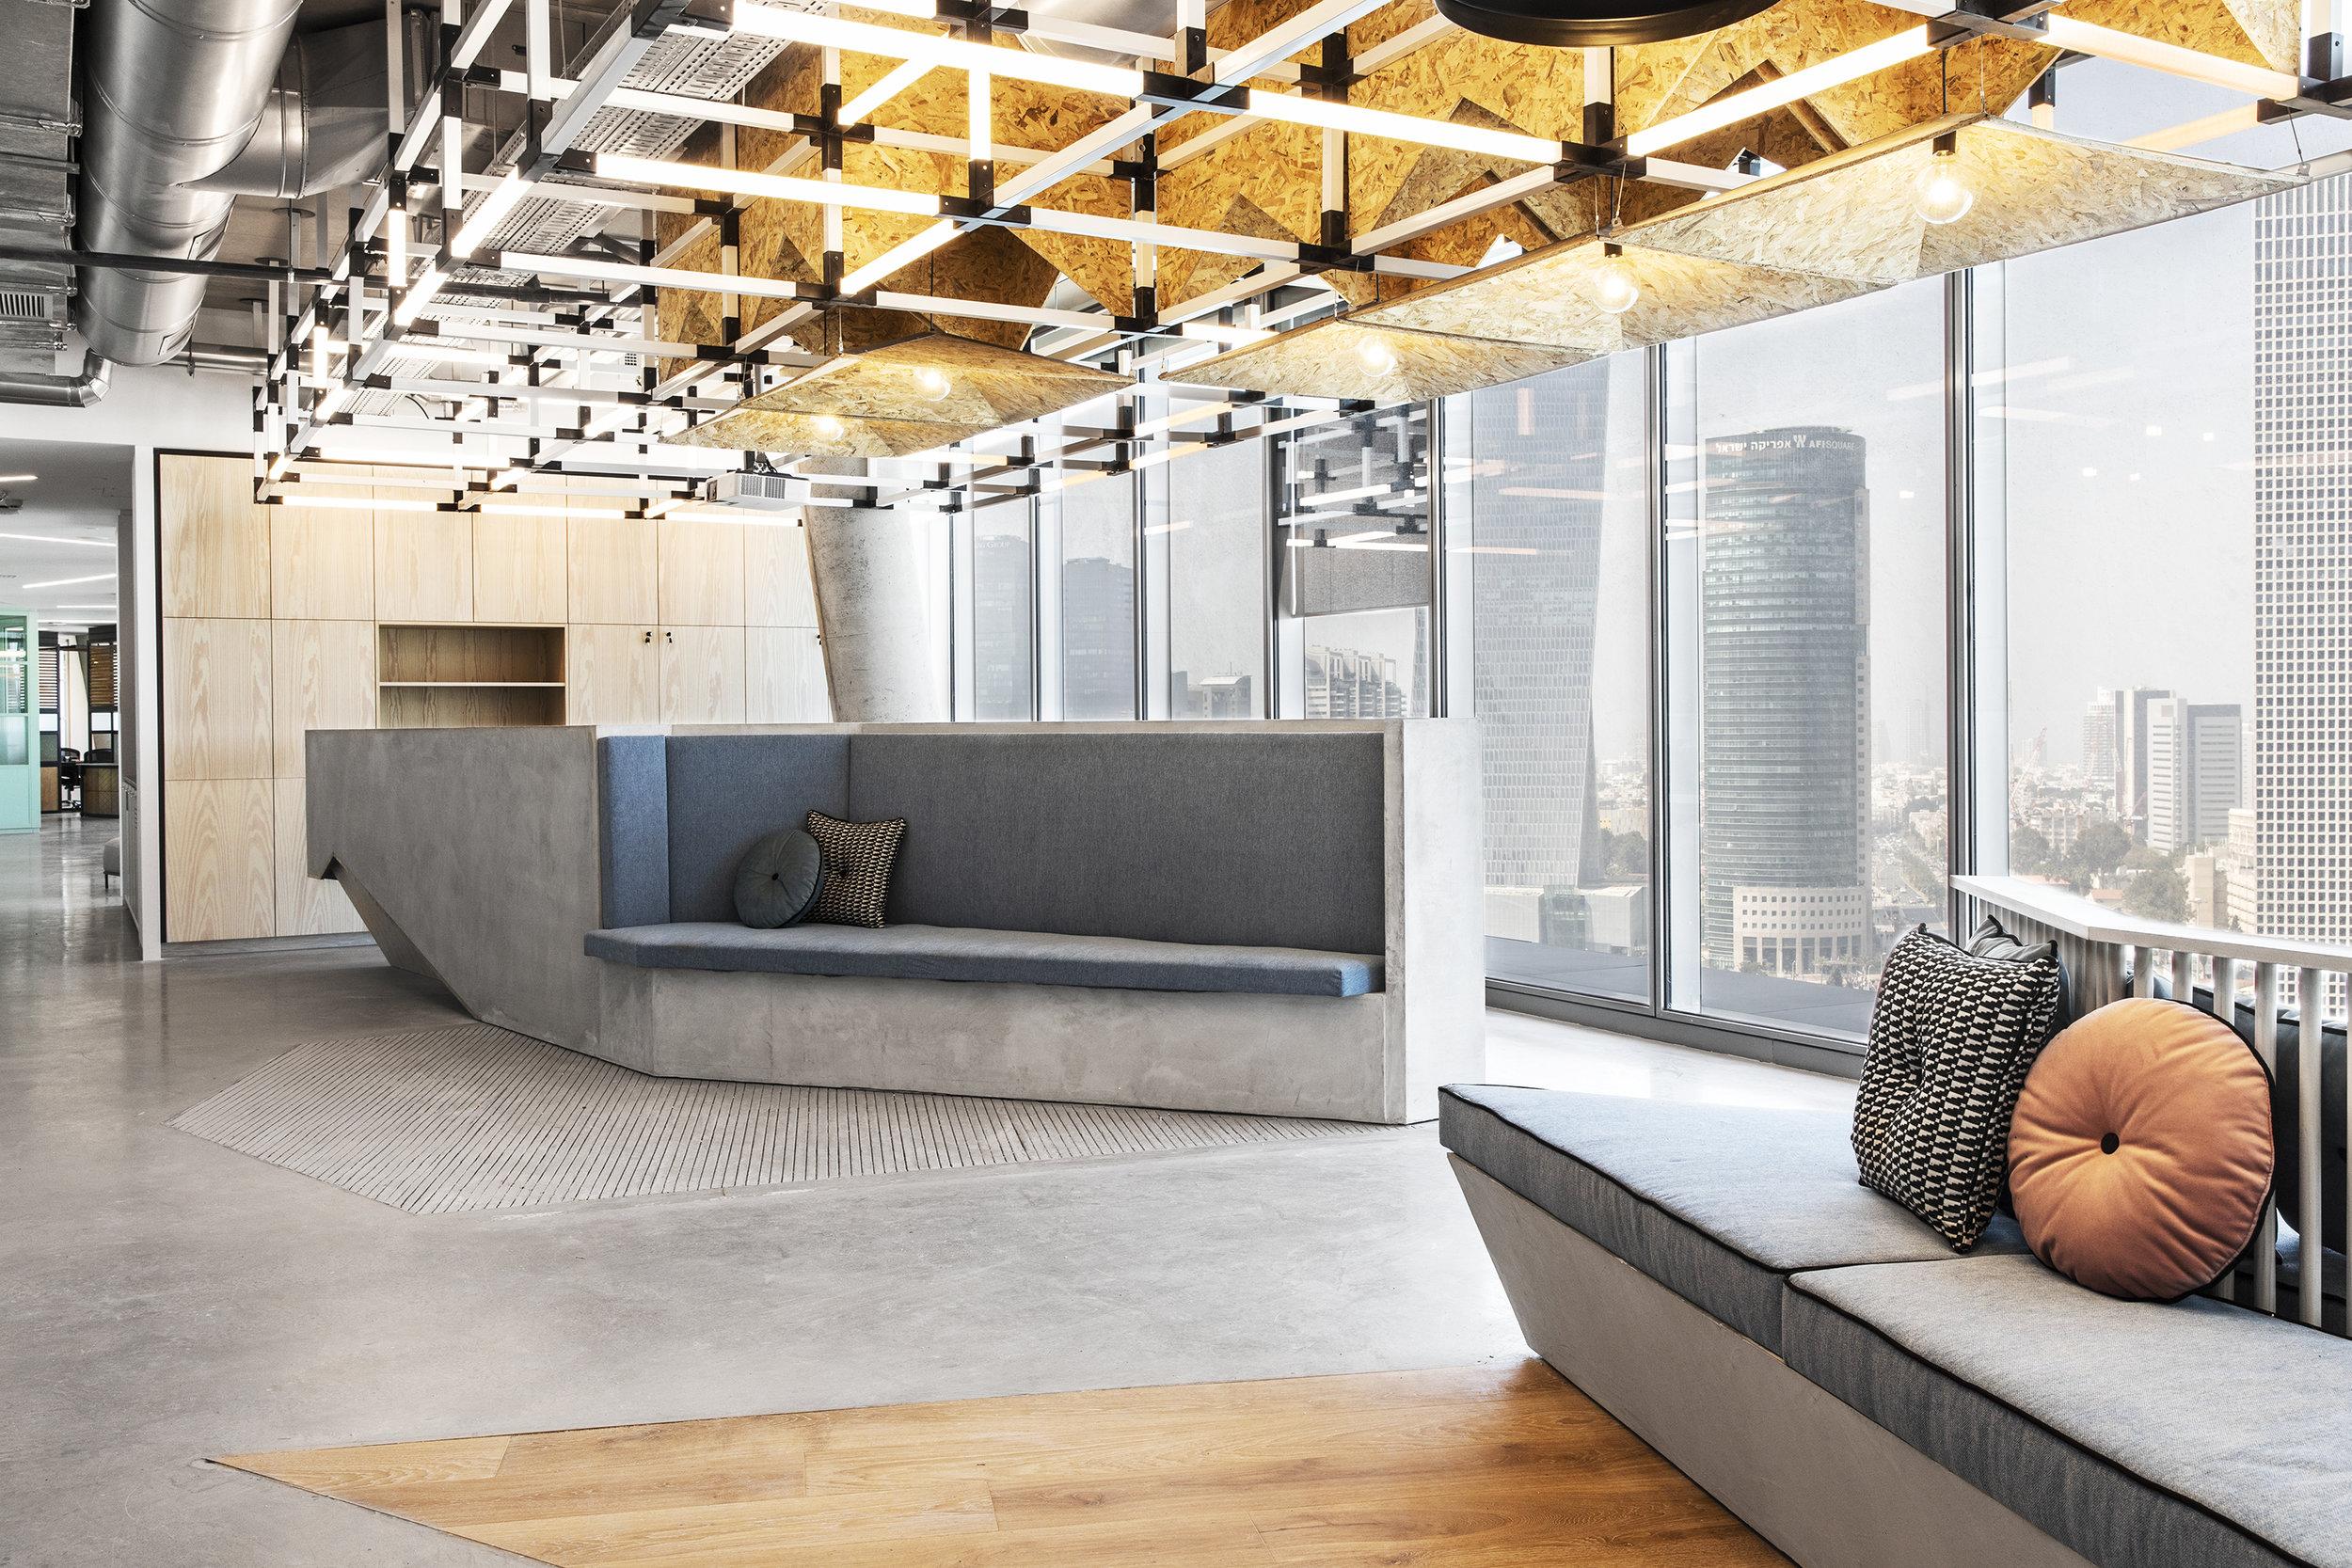 רואי דוד אדריכלות - אדריכל - נטורל אינטליג'נס - ROY DAVID - ARCHITECTURE - ARCHITECT - NI (34).jpg